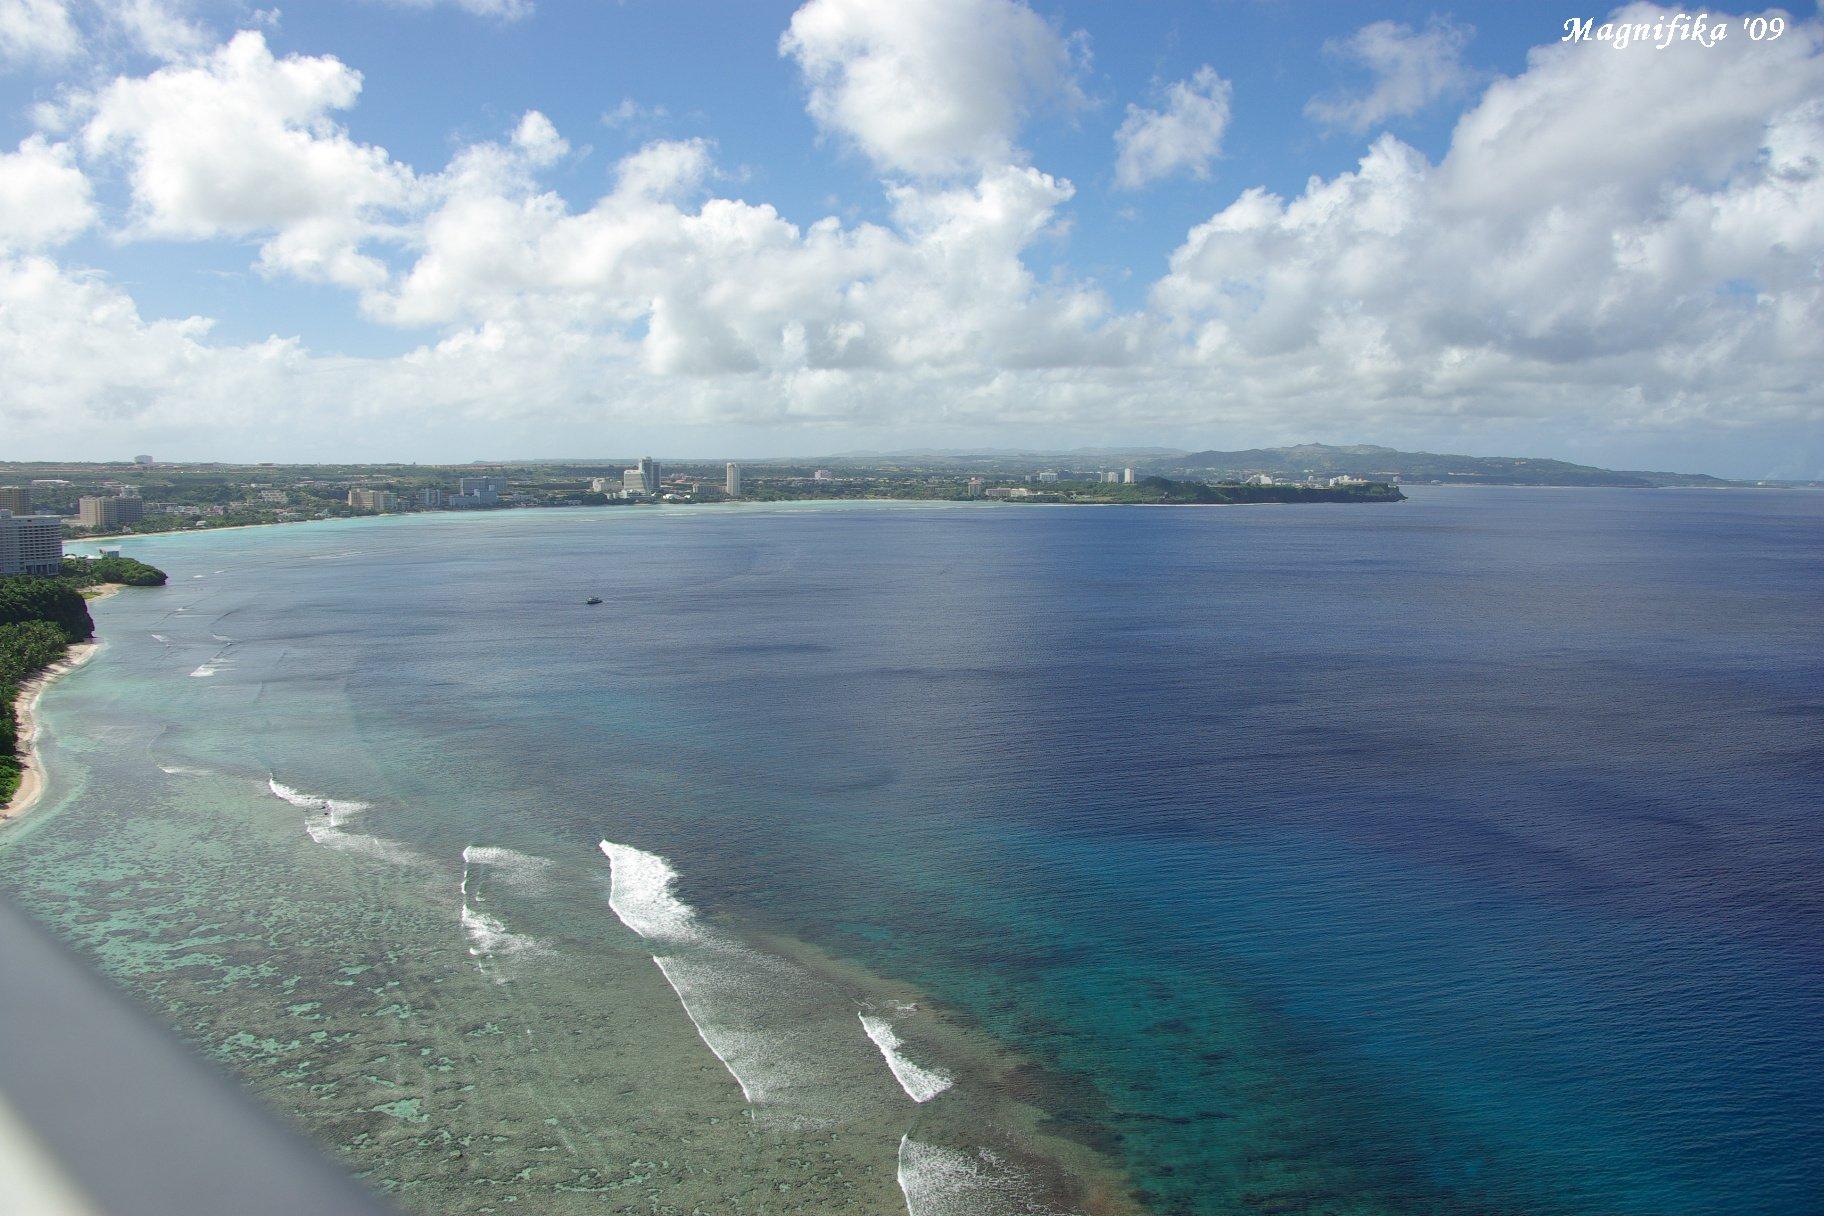 ASUKA II 南太平洋グランドクルーズ2009-6 グアム恋人岬 Two Lovers\' Point in Guam_e0140365_19432535.jpg